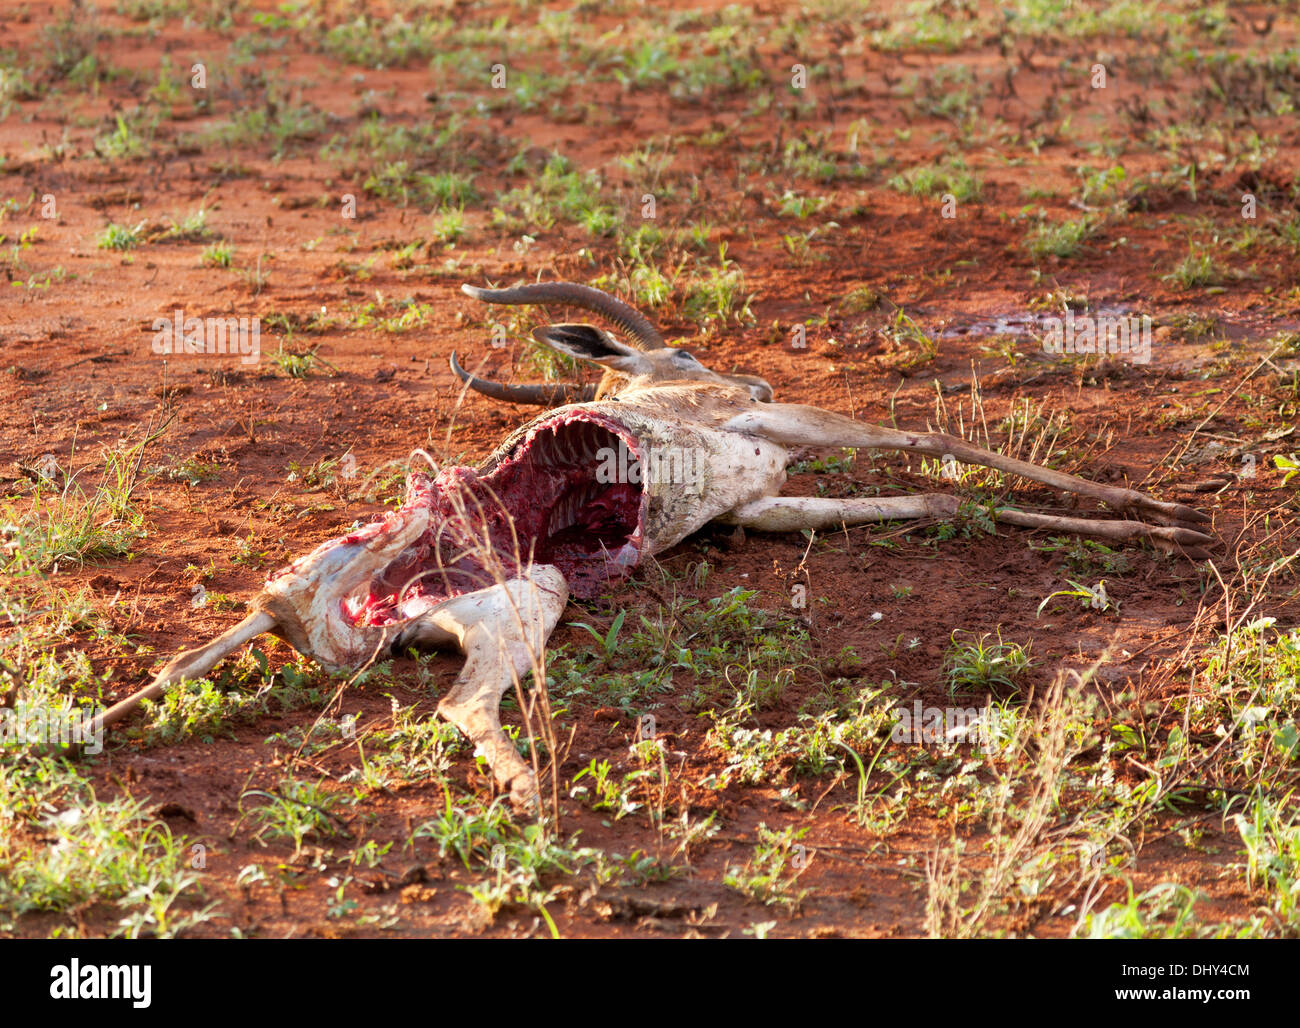 Killed antelope, Samburu National Reserve, Kenya - Stock Image